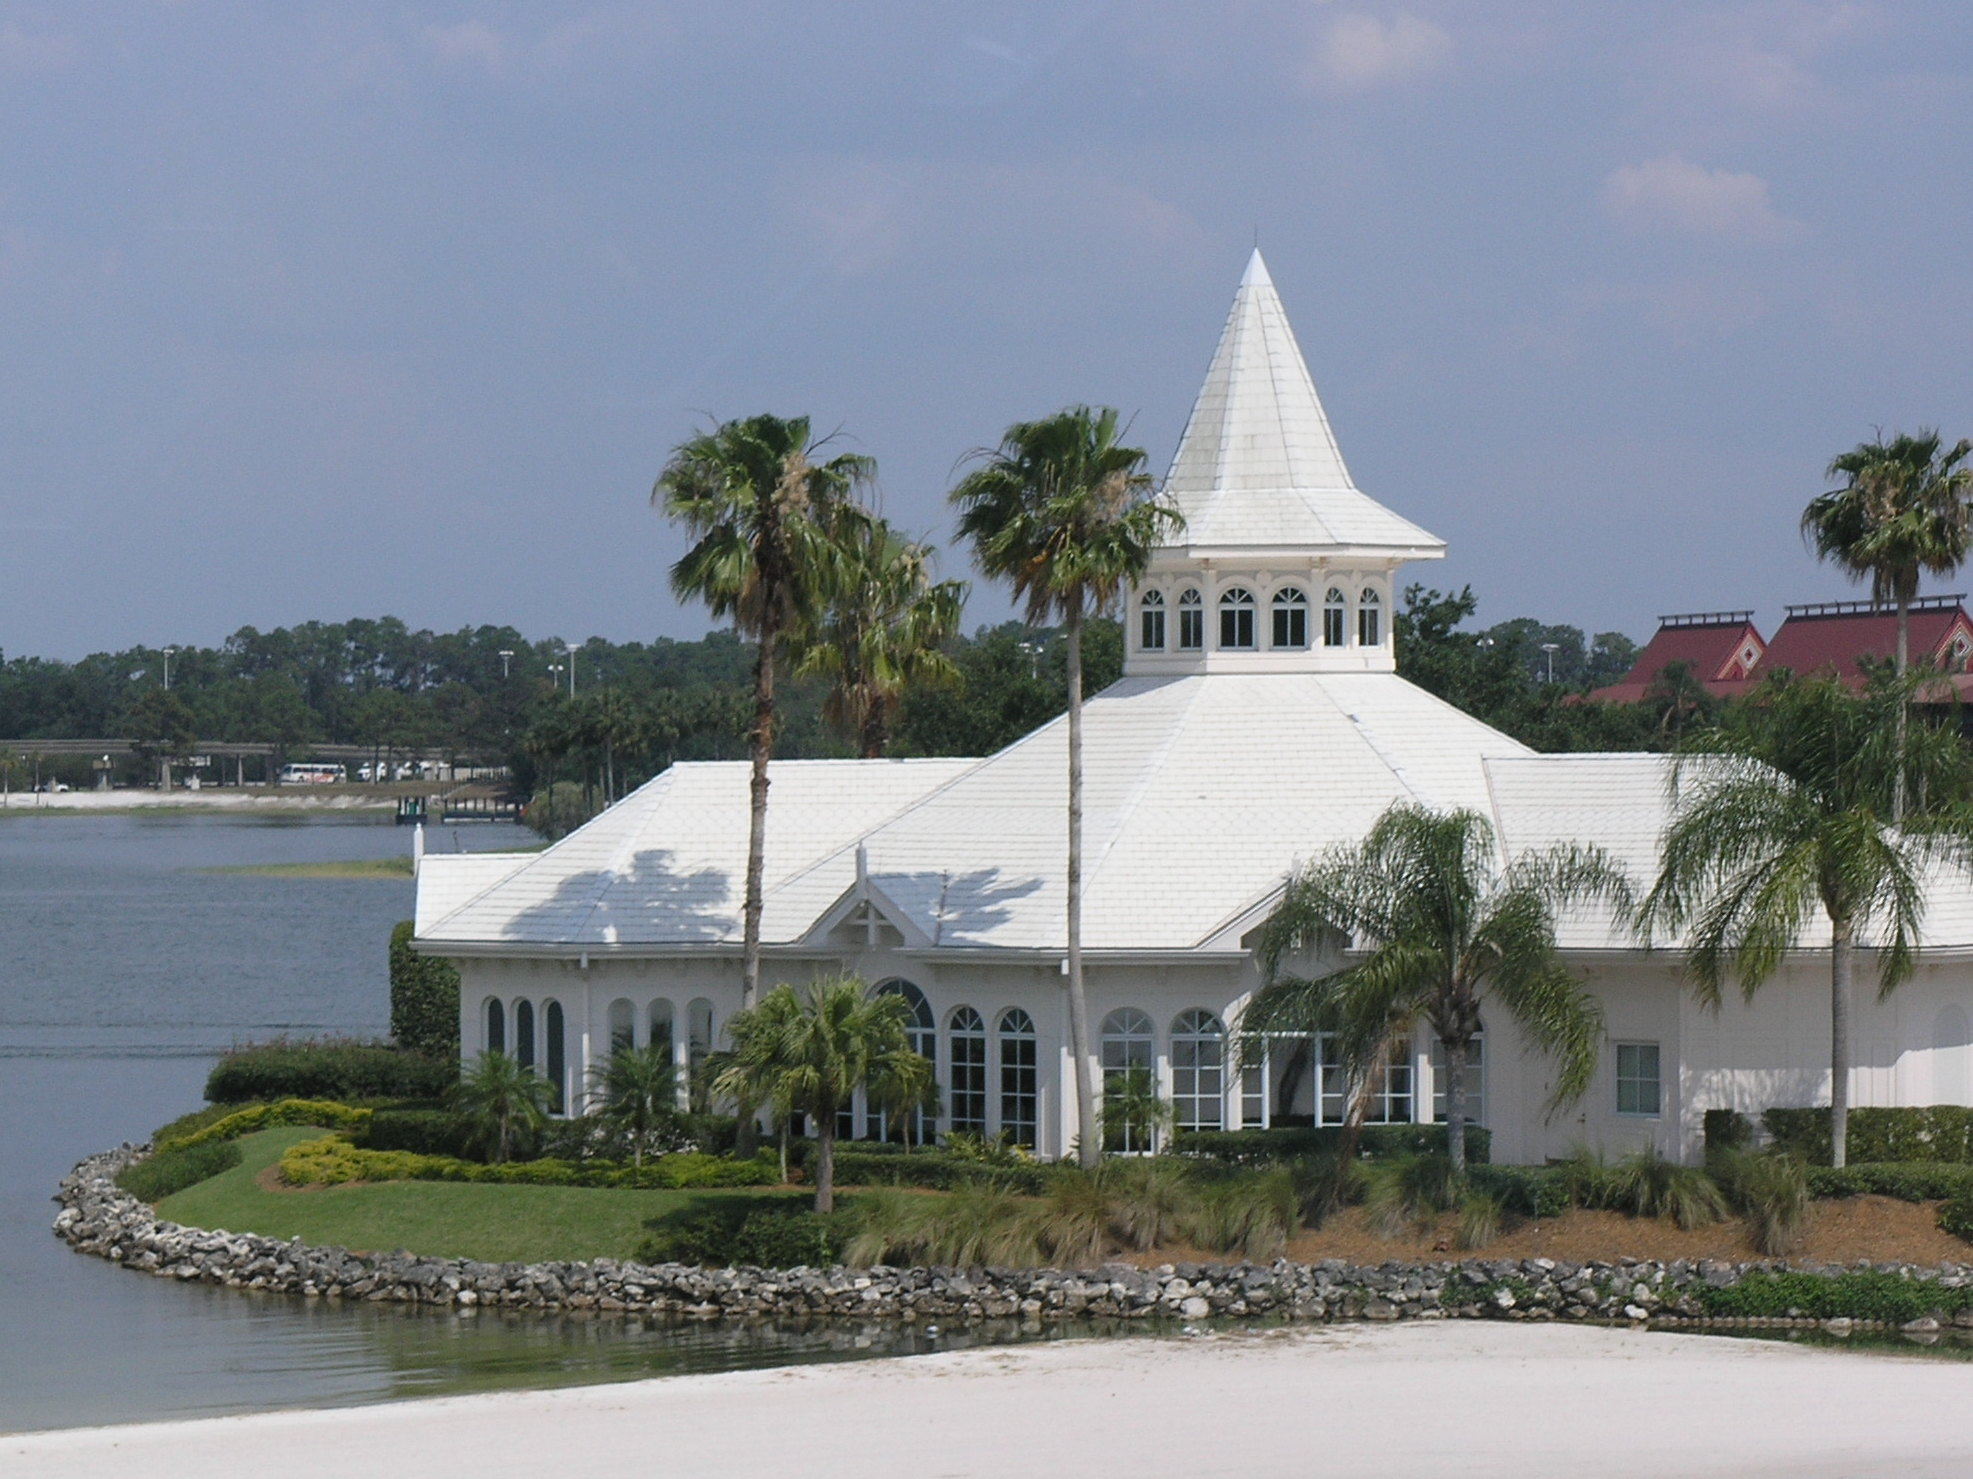 disney s wedding pavilion wikipedia